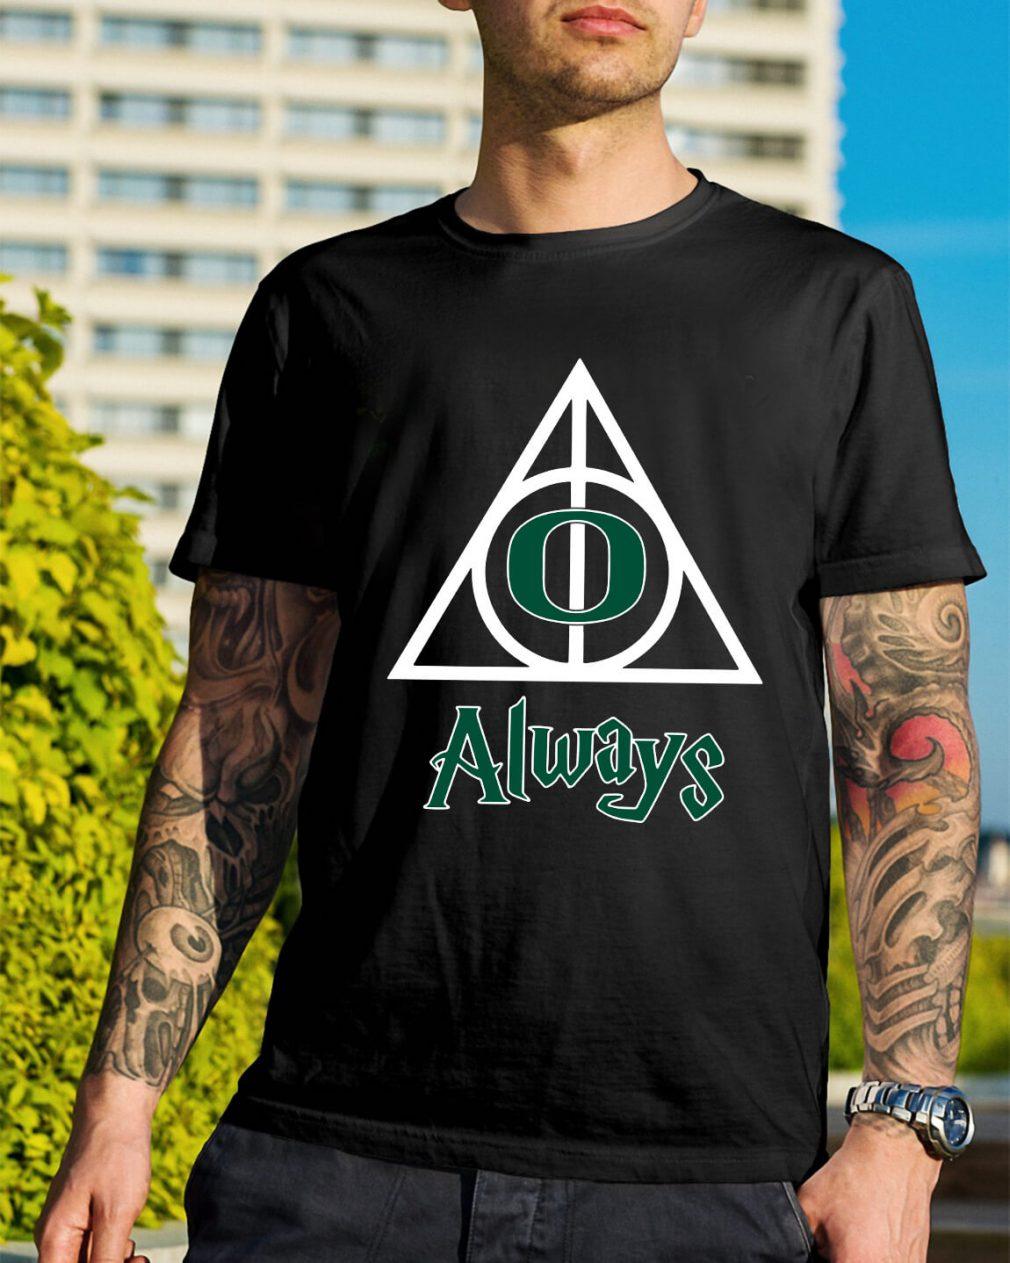 Oregon Ducks Deathly Hallows always Harry Potter shirt